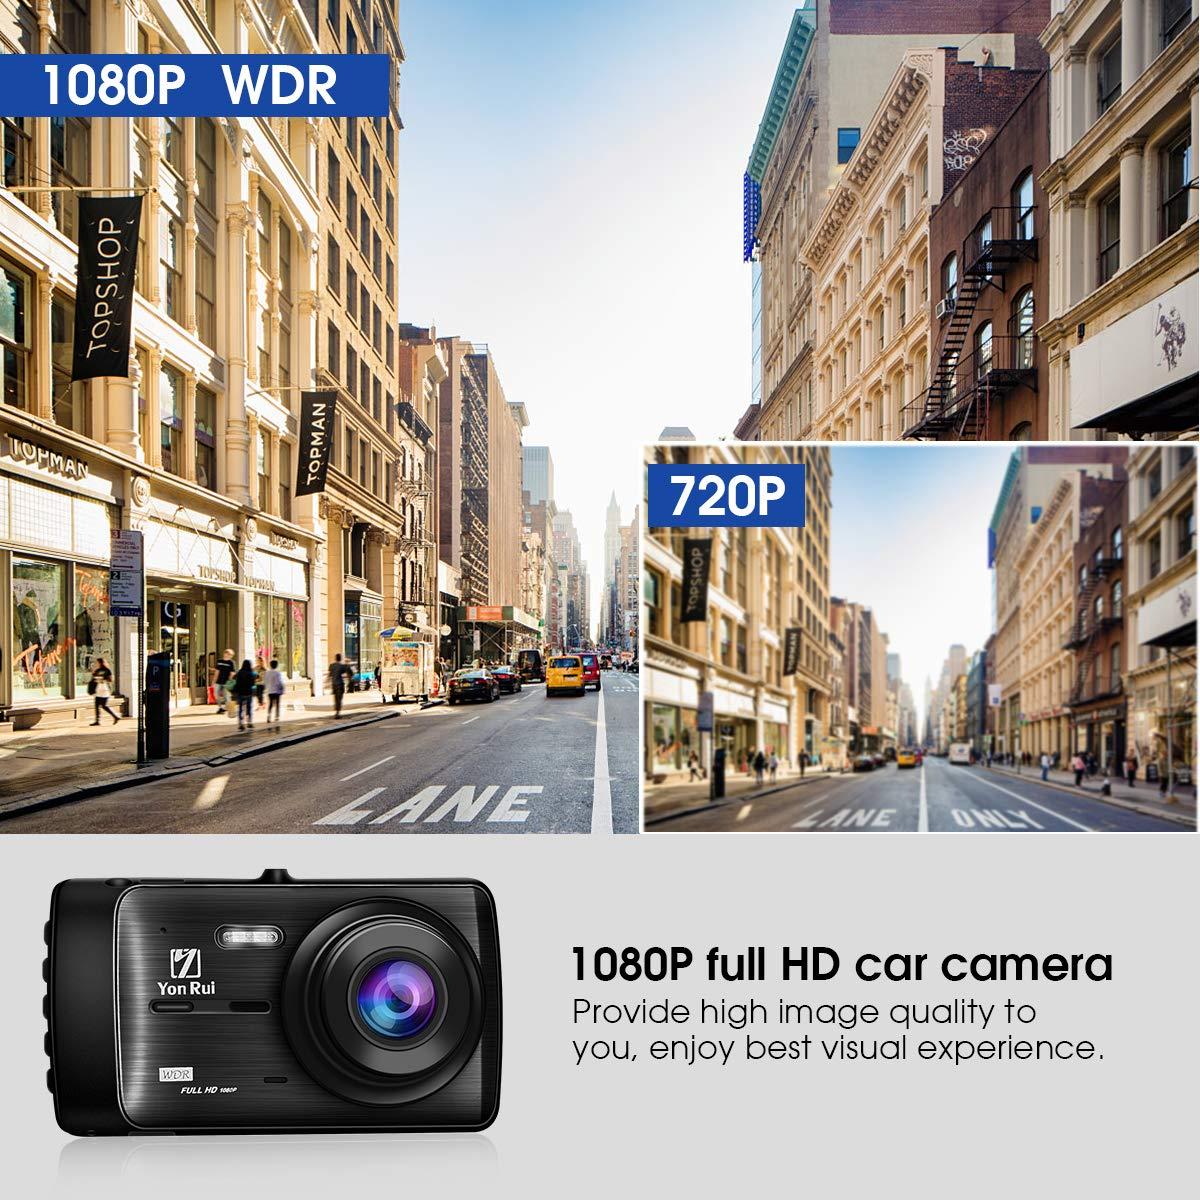 Upgraded Version Dash Cam Dashboard Camera Recorder Rear Camera-4 Full HD 1080P Car DVR Dashboard Camera G-Sensor Parking Guard Loop Recording YonRui Dash Camera Dash CameraYR907 WDR